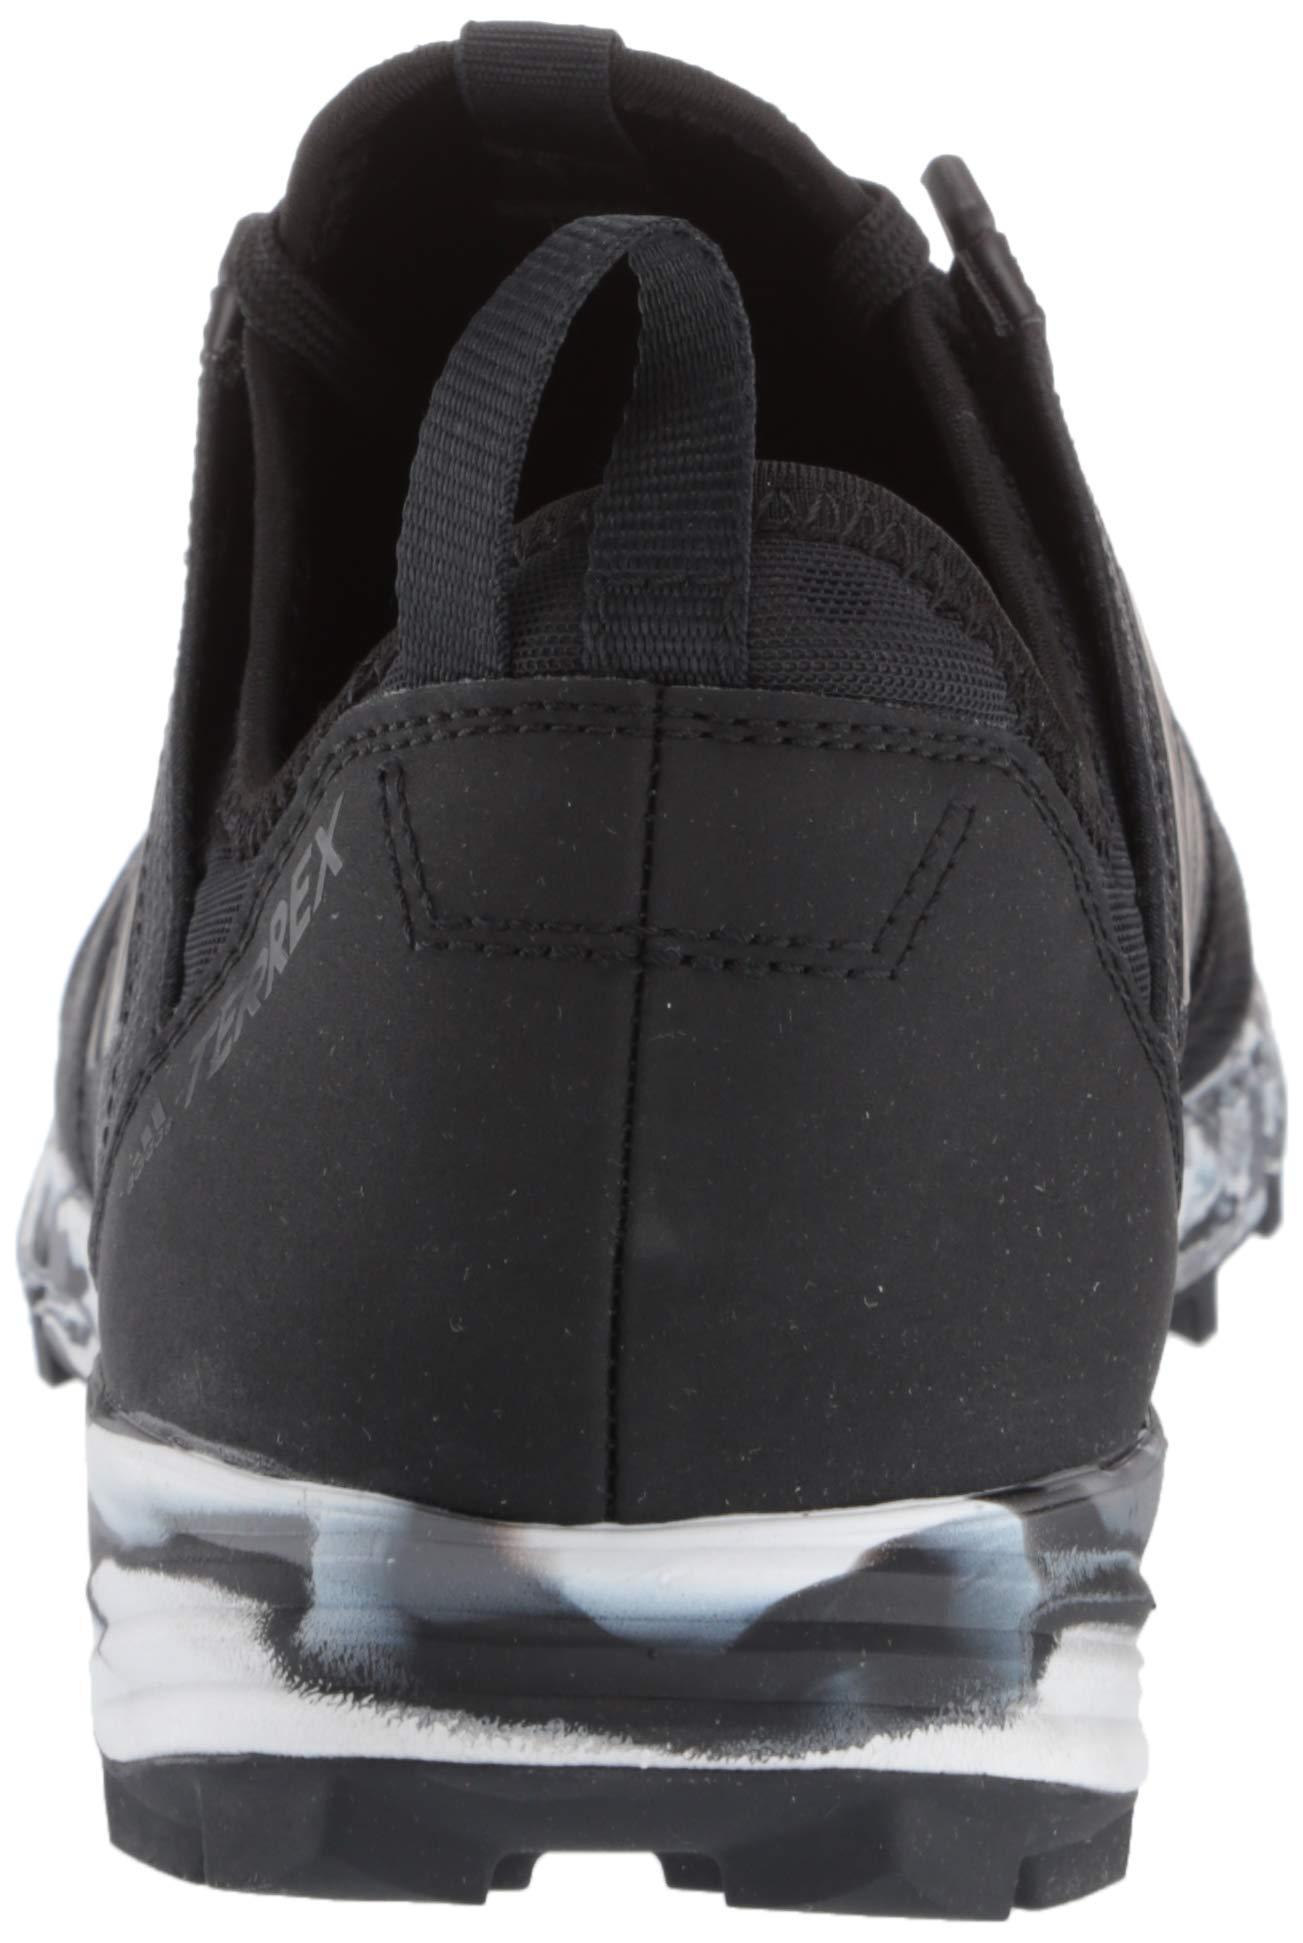 adidas outdoor Women's Terrex Speed Trail Running Shoe